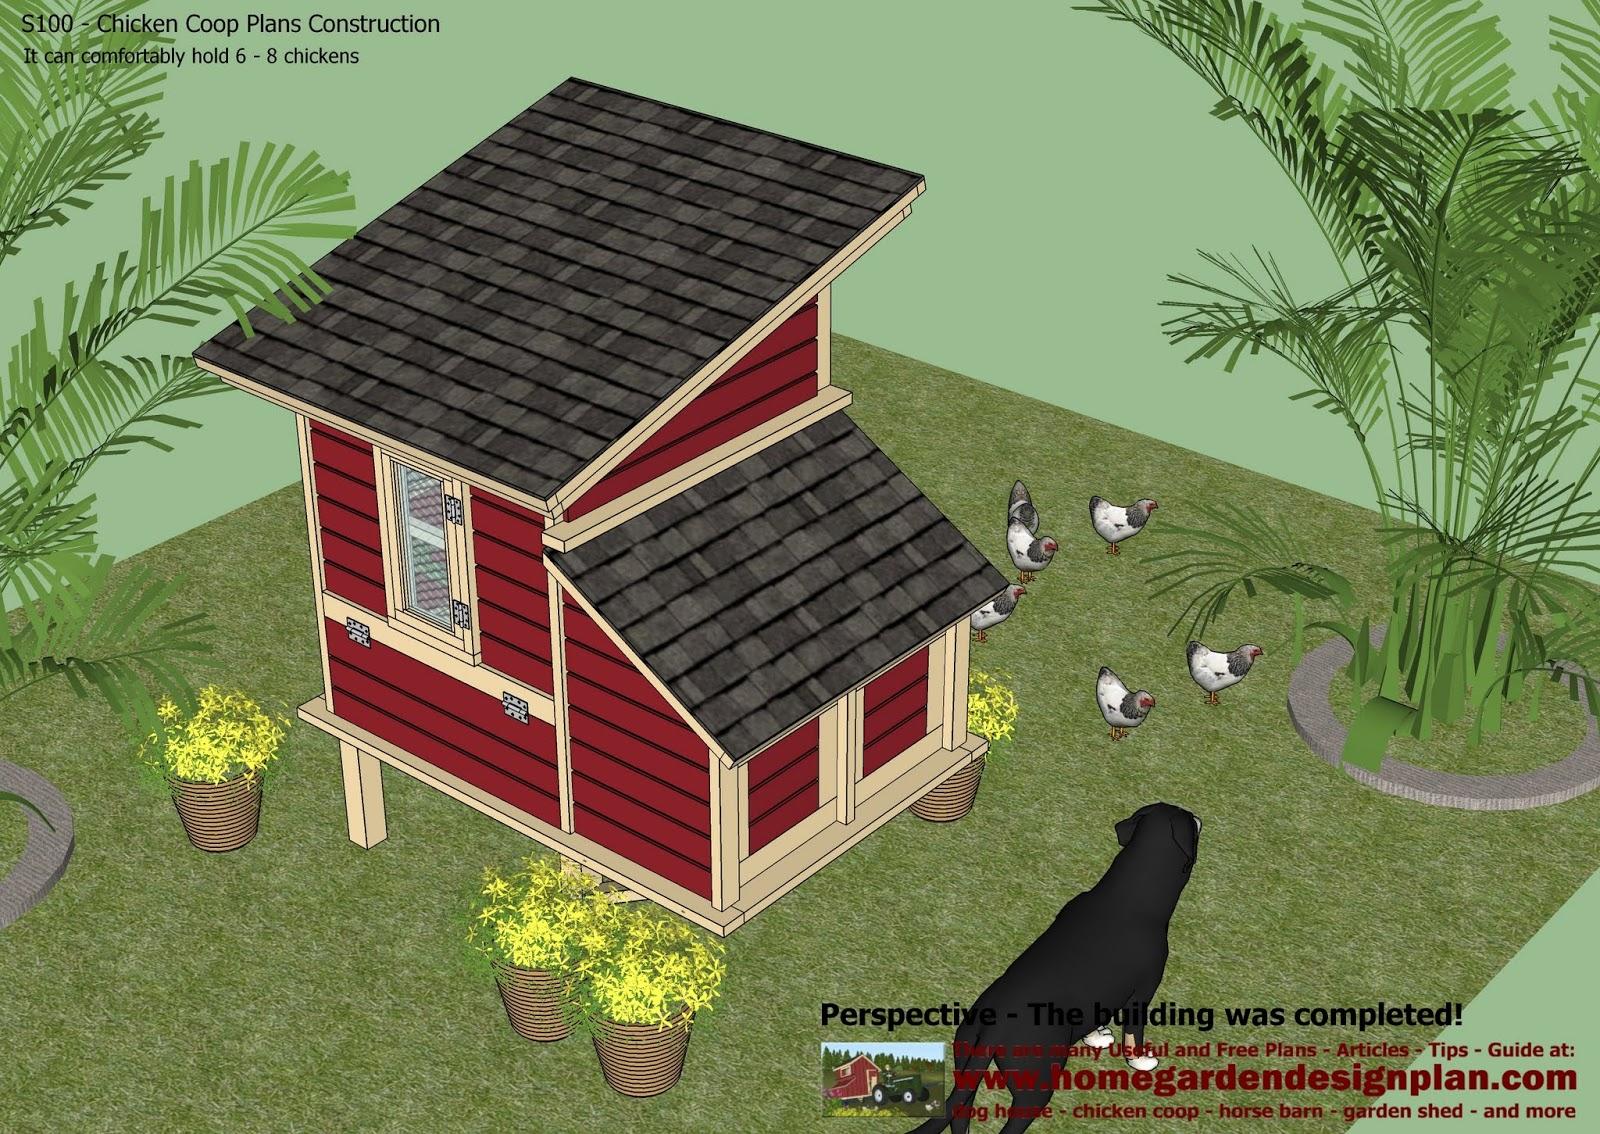 home garden plans: S300 - Chicken Coop Plans Construction ...